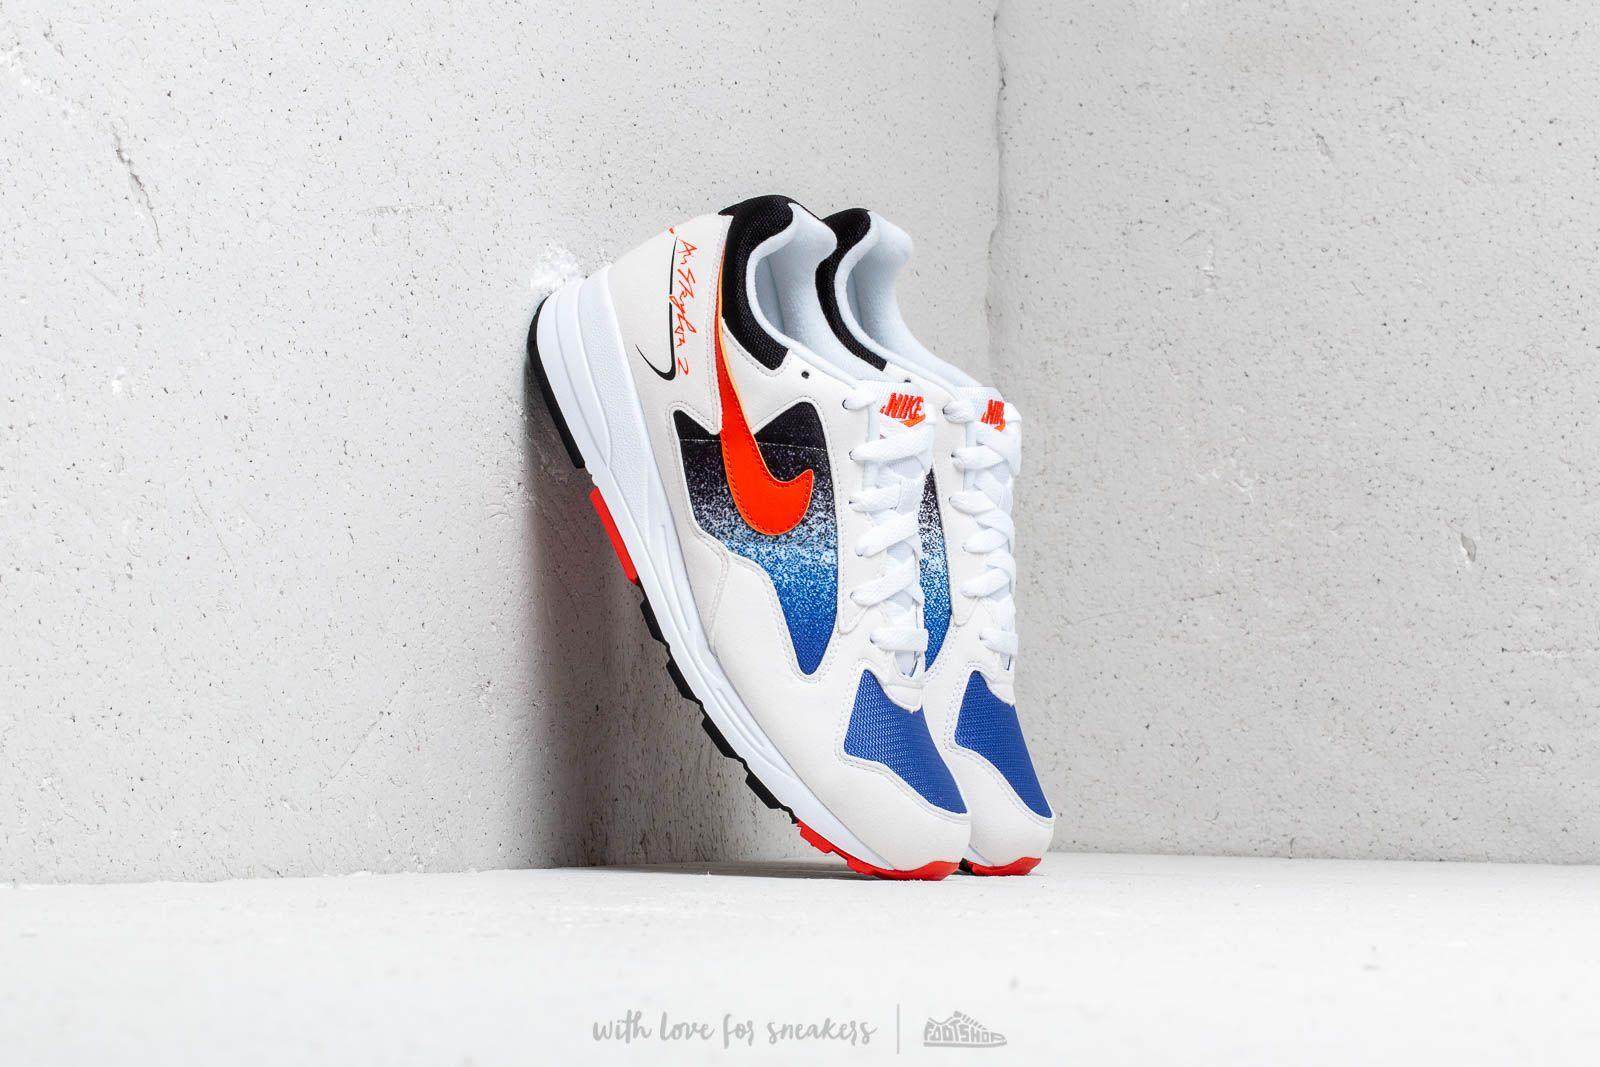 Pánské tenisky a boty Nike Air Skylon II White/ Team Orange-Hyper Royal-Black